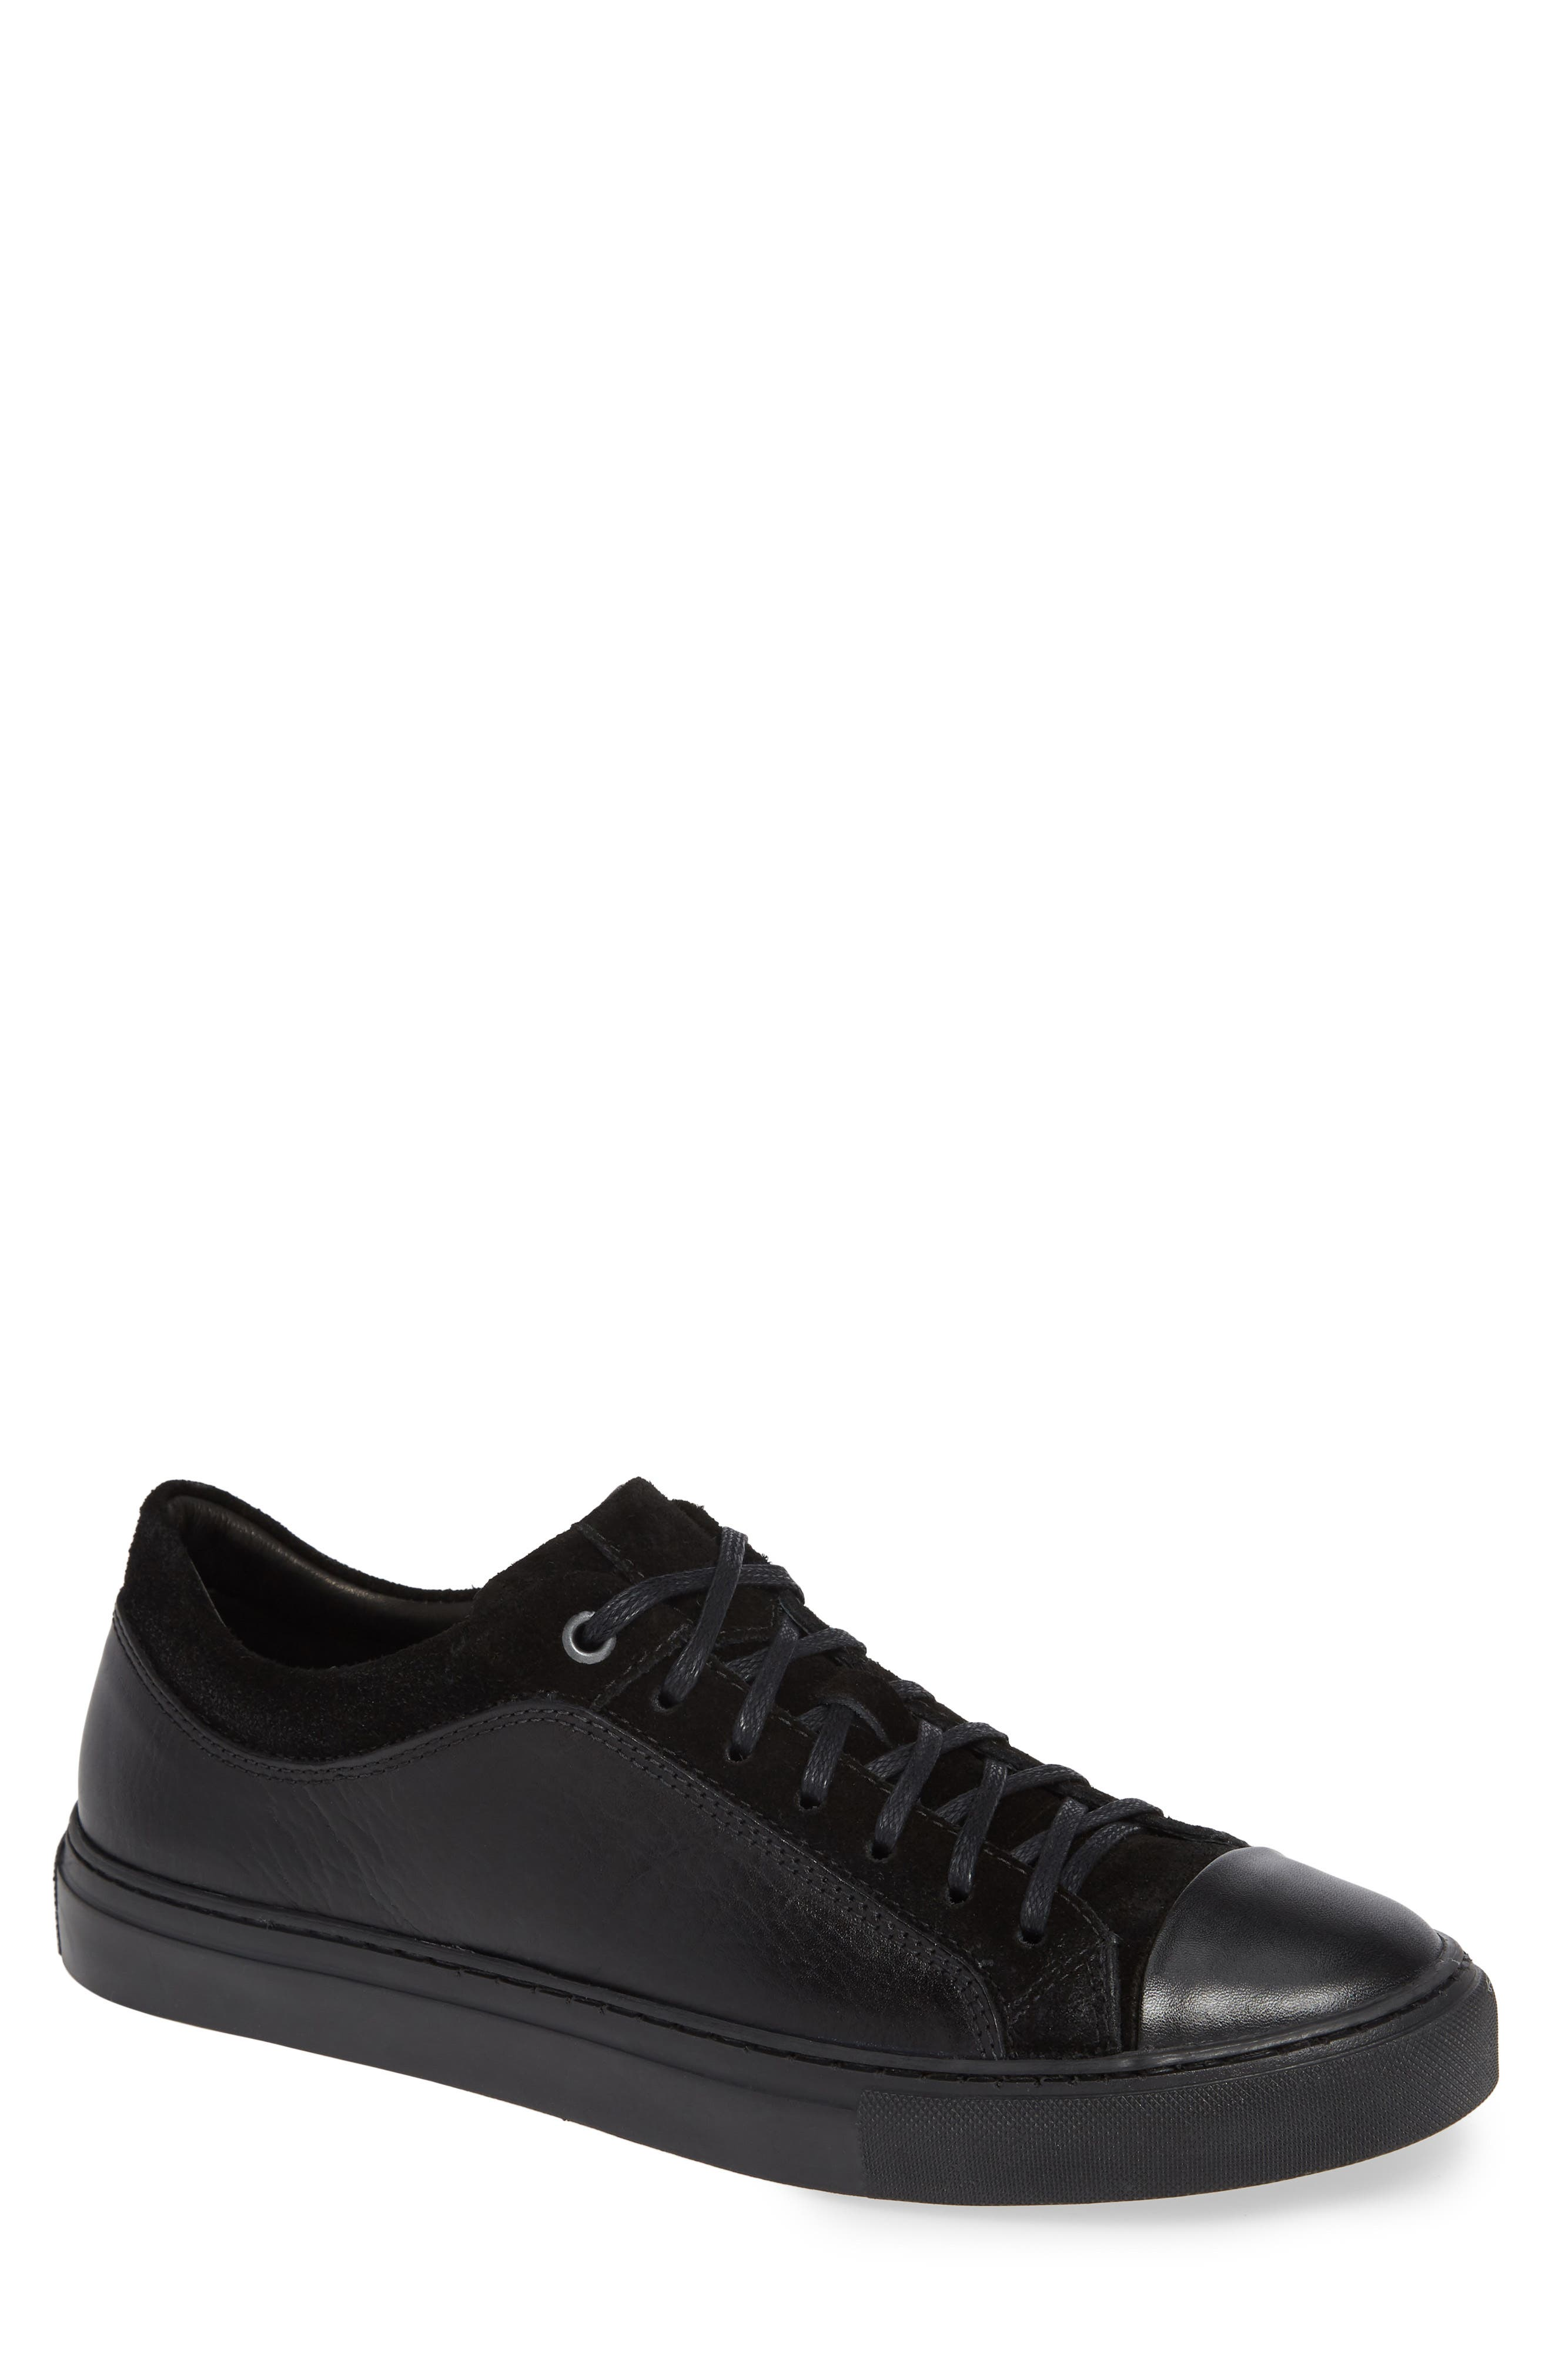 Berkeley Sneaker,                             Main thumbnail 1, color,                             BLACK